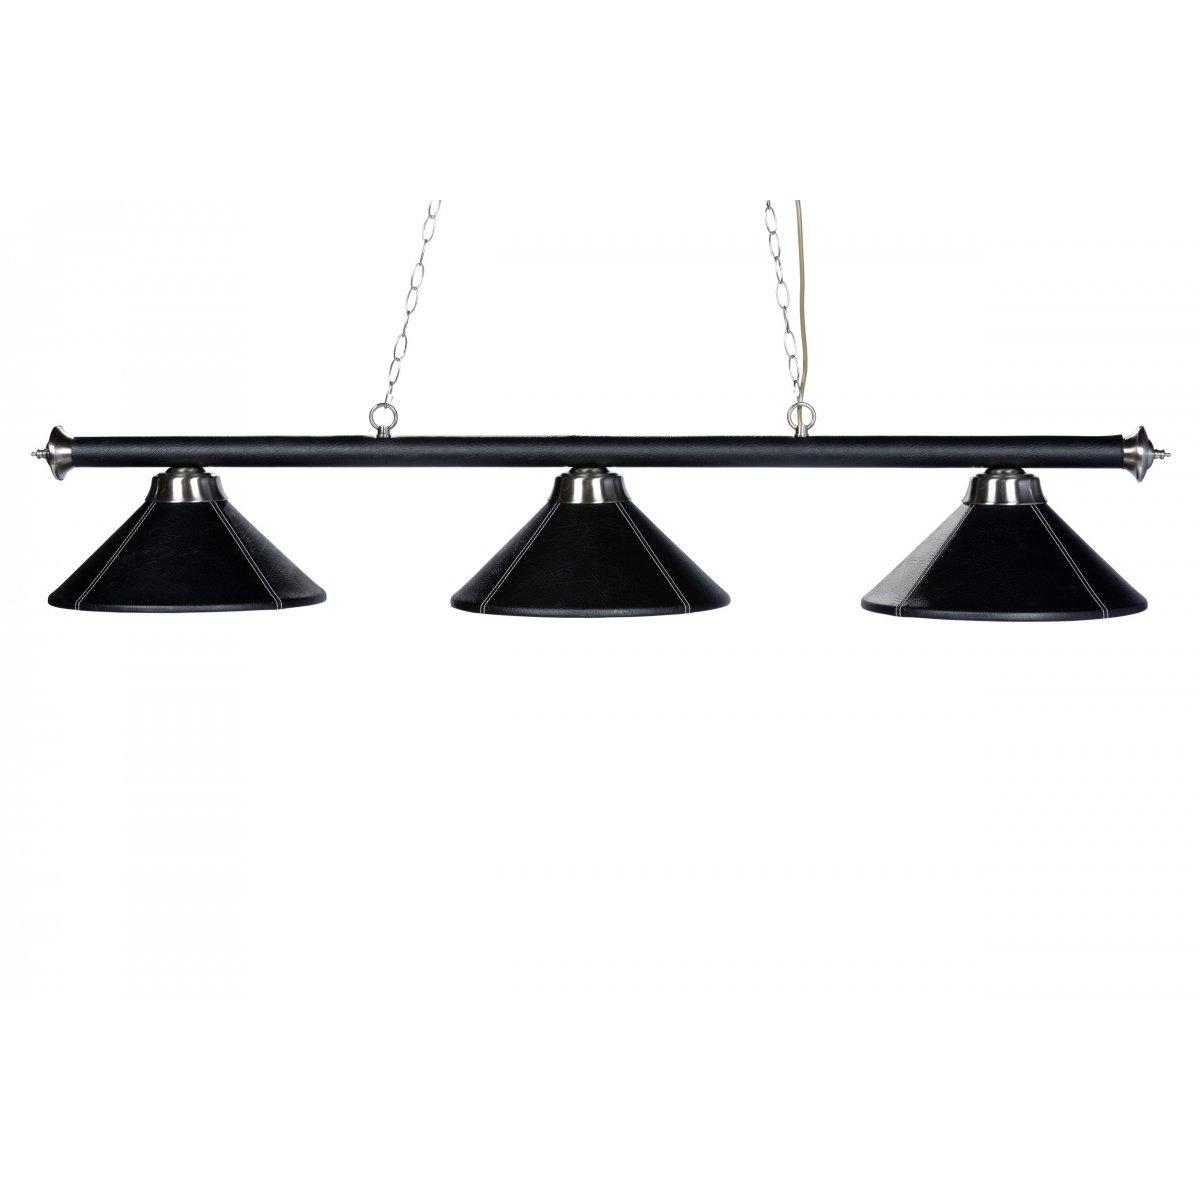 lustre 3 lampes en cuir synth tique avec surpiqures blanches billards de france. Black Bedroom Furniture Sets. Home Design Ideas